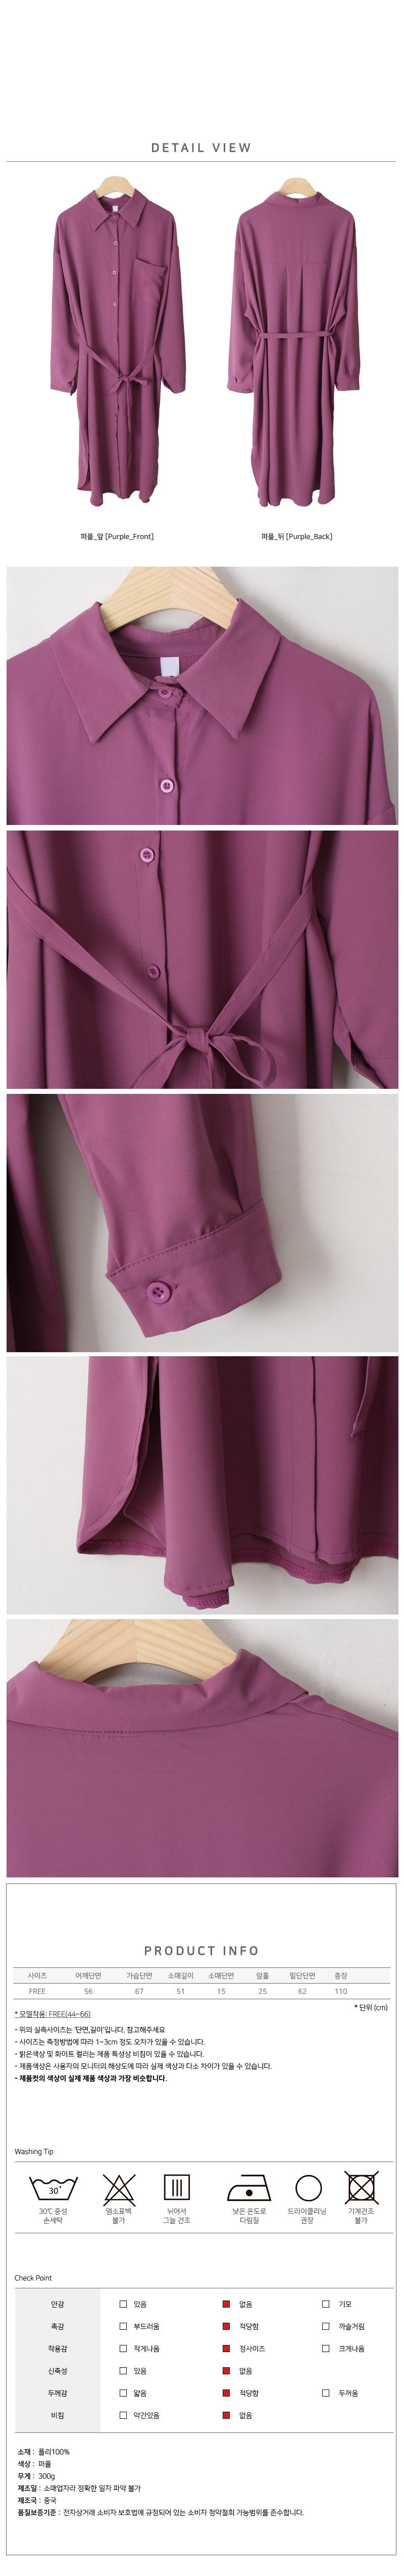 Purple Look Silky Shirt Dress